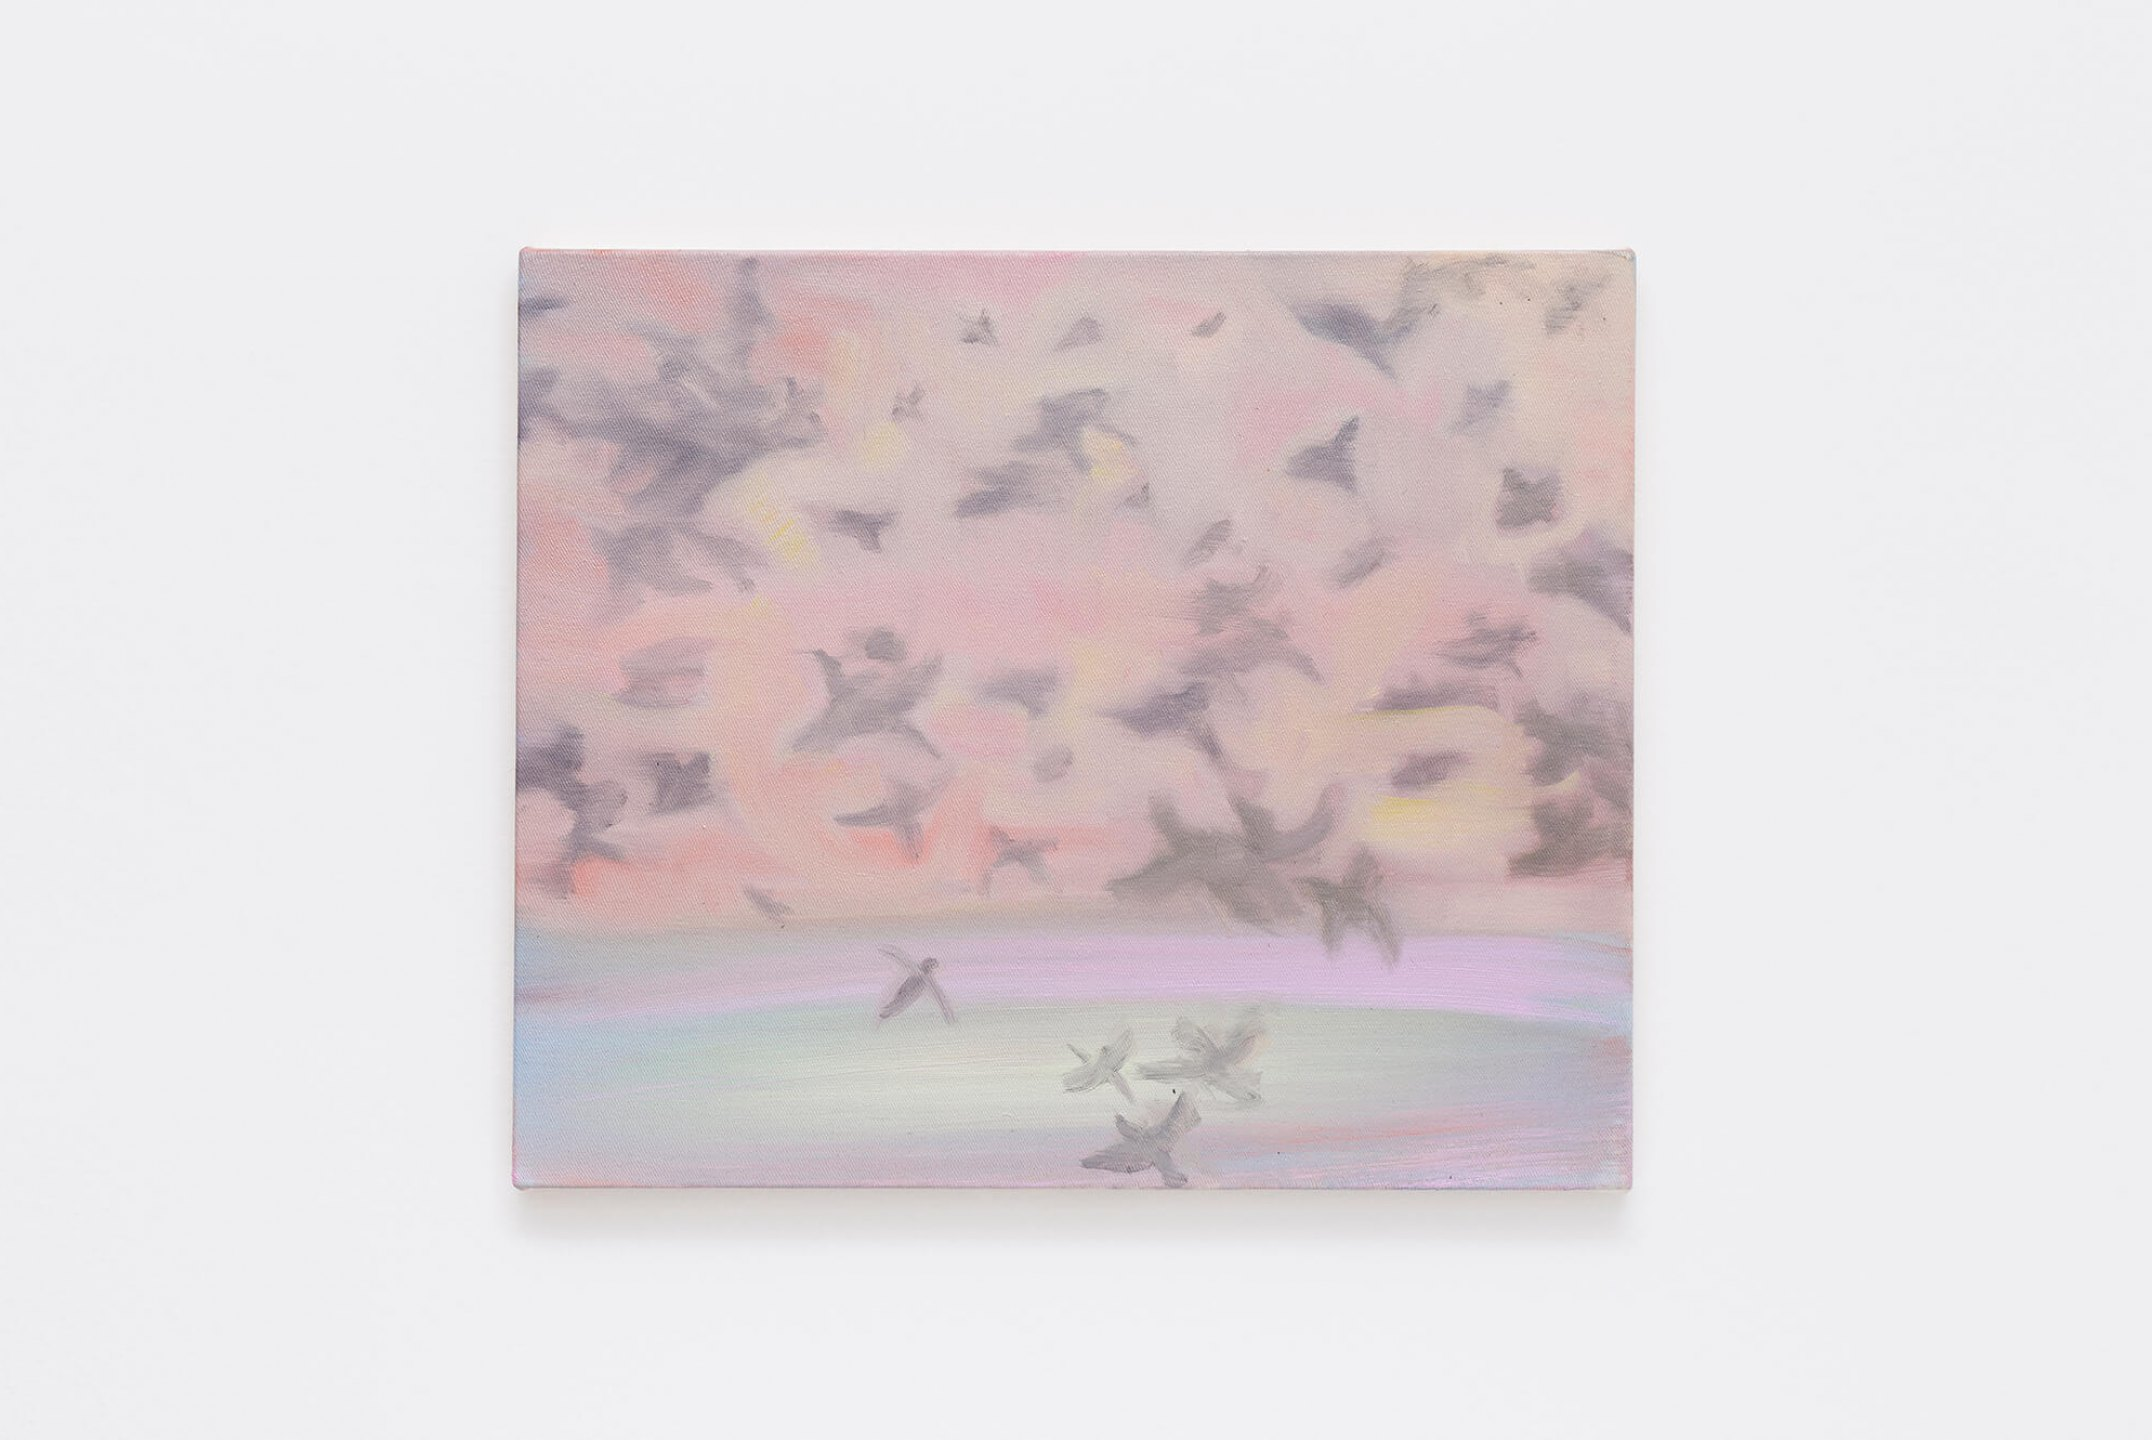 Marina Perez Simão,<em>&nbsp;Untitled,</em>&nbsp;2015, oil on canvas, 36 × 43 cm&nbsp; - Mendes Wood DM